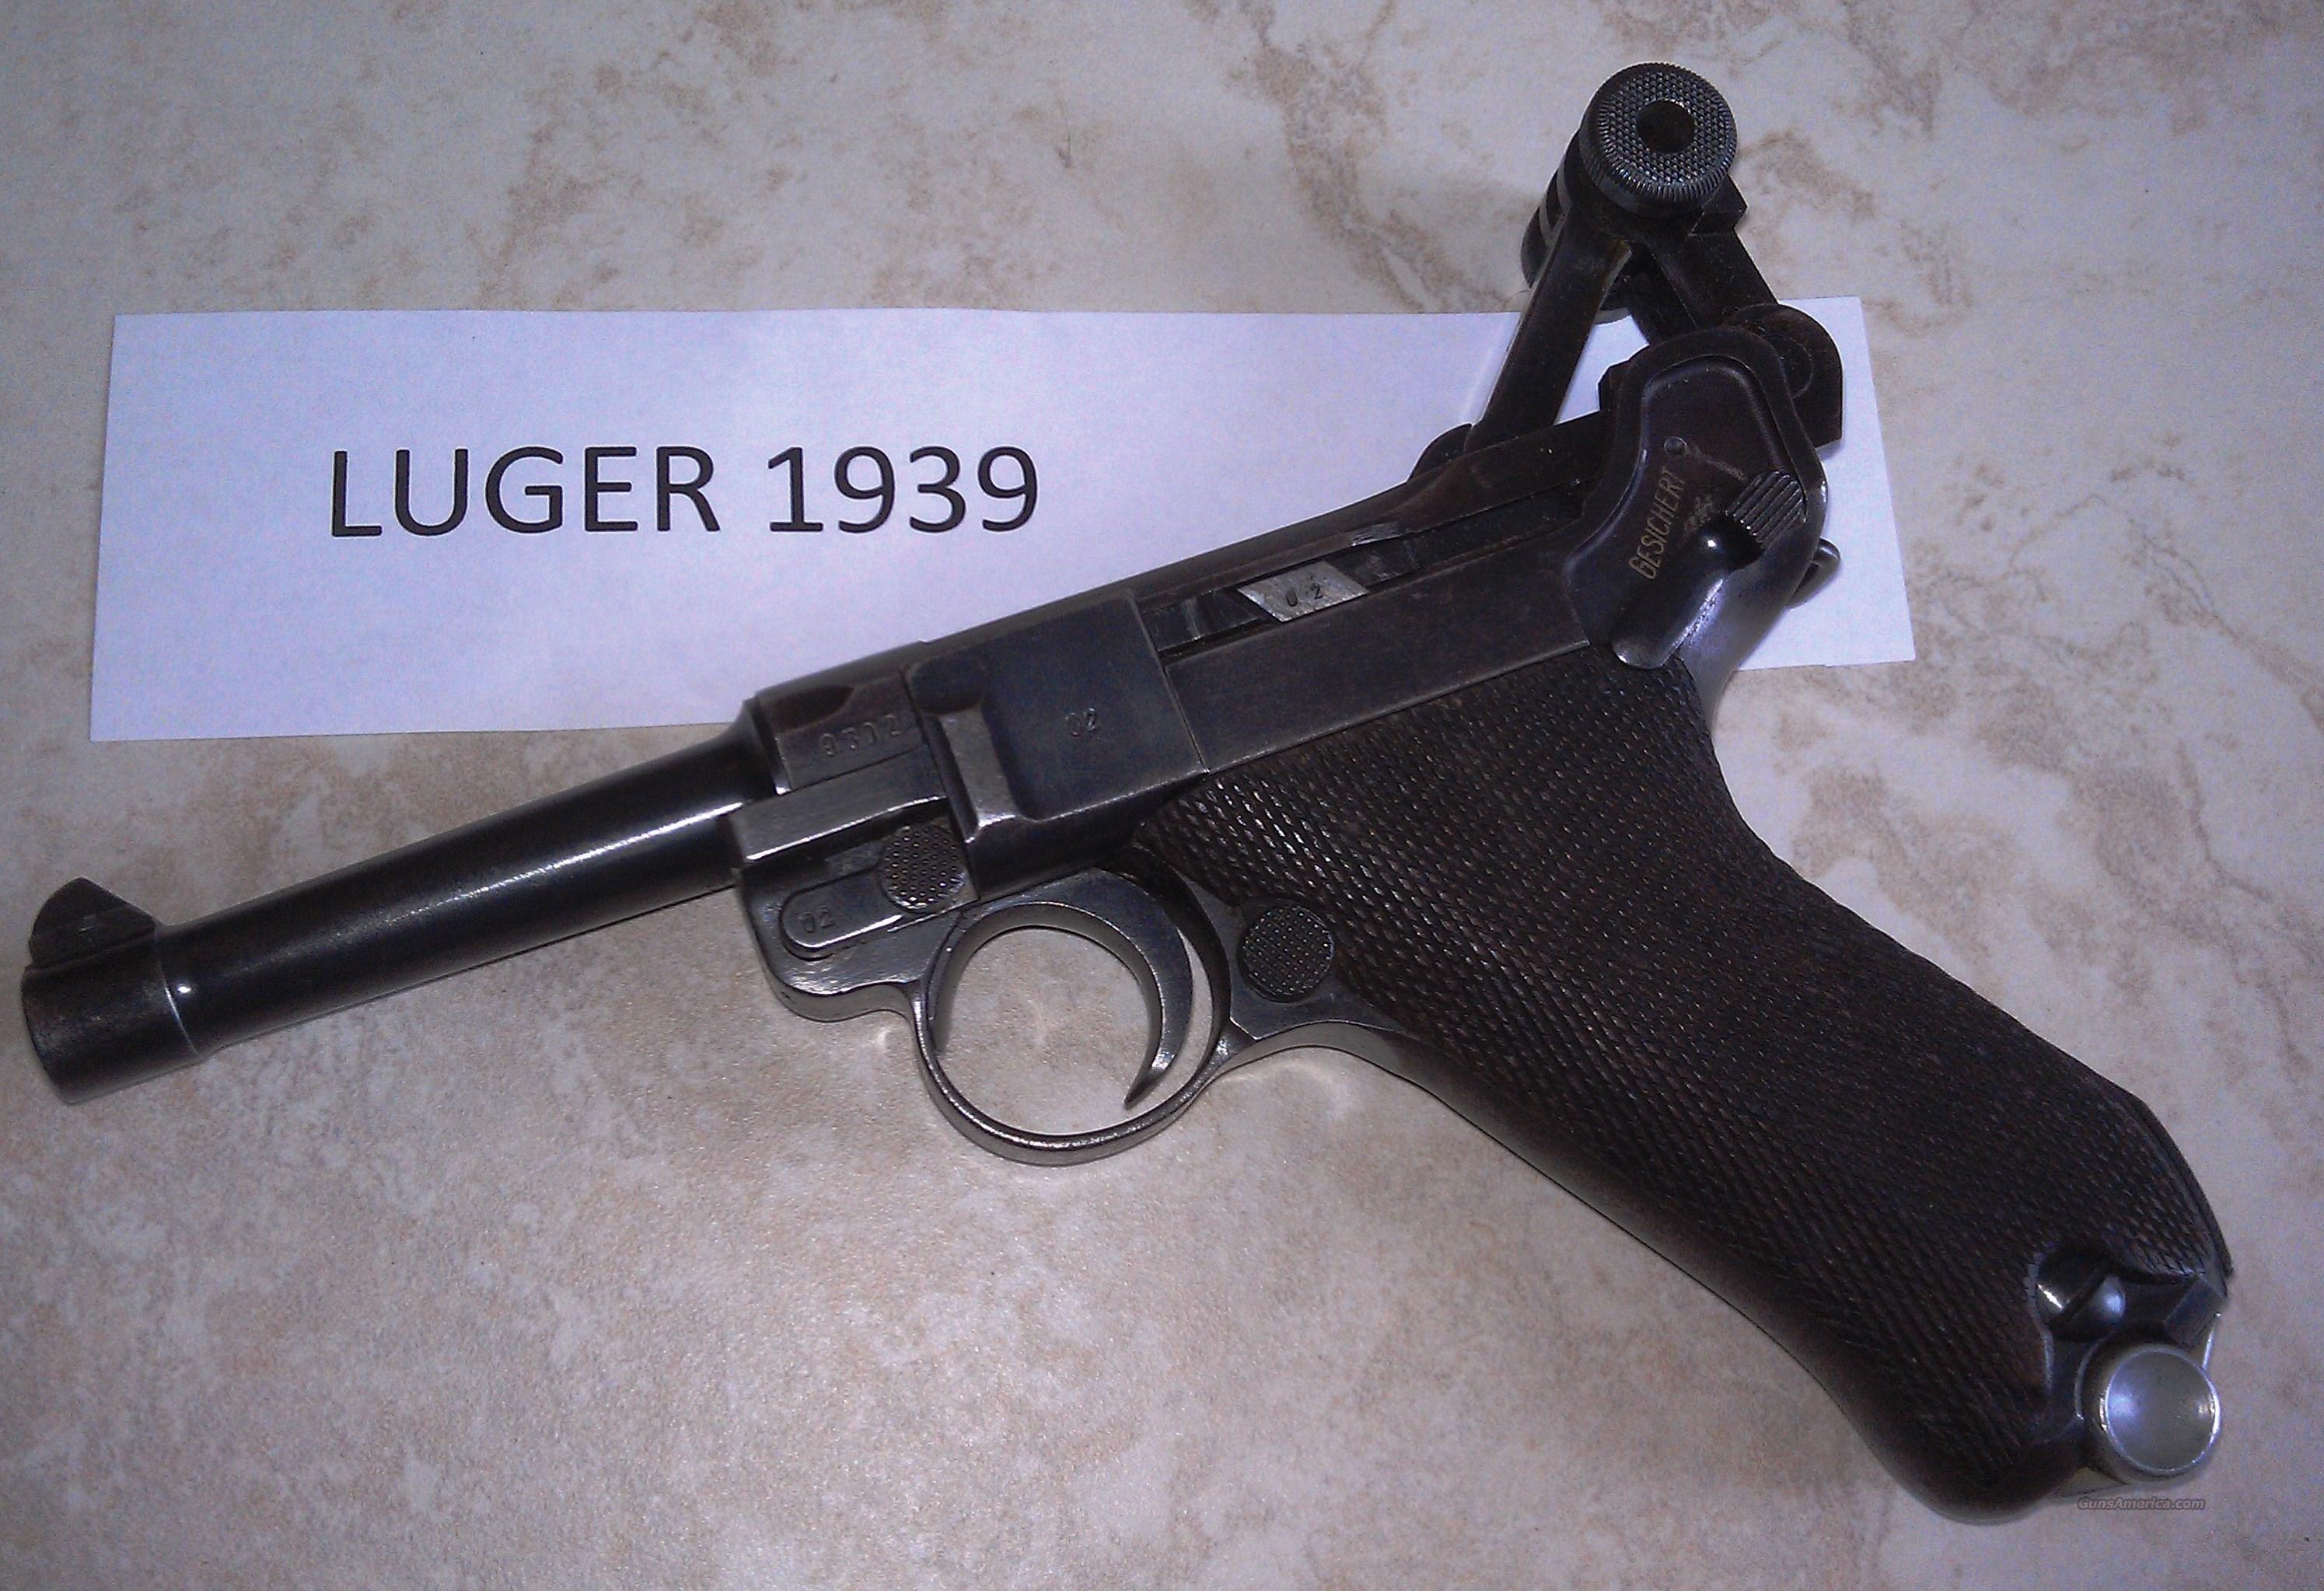 1939 Luger WW2 Pistol, original all matching, German, Excellent!